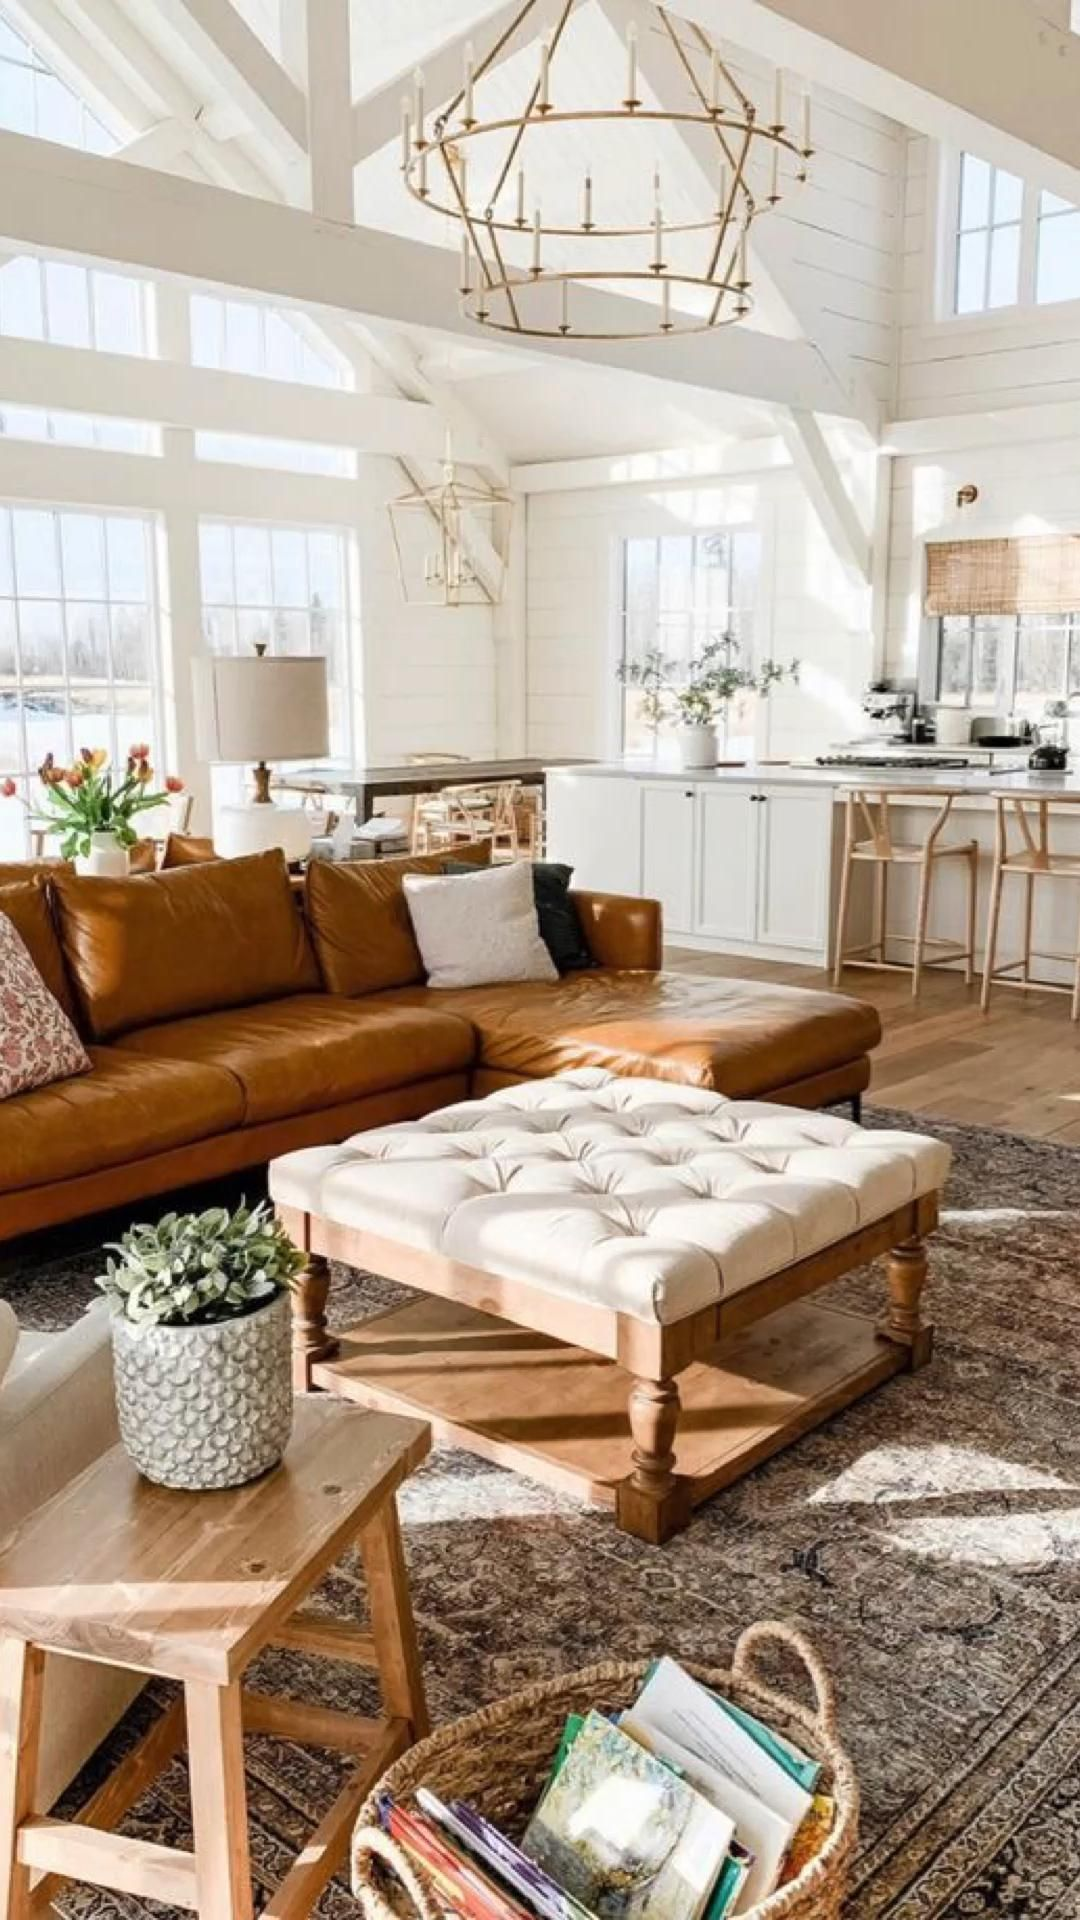 15 Cozy Interior Design Ideas for Space Saving Breakfast Nooks